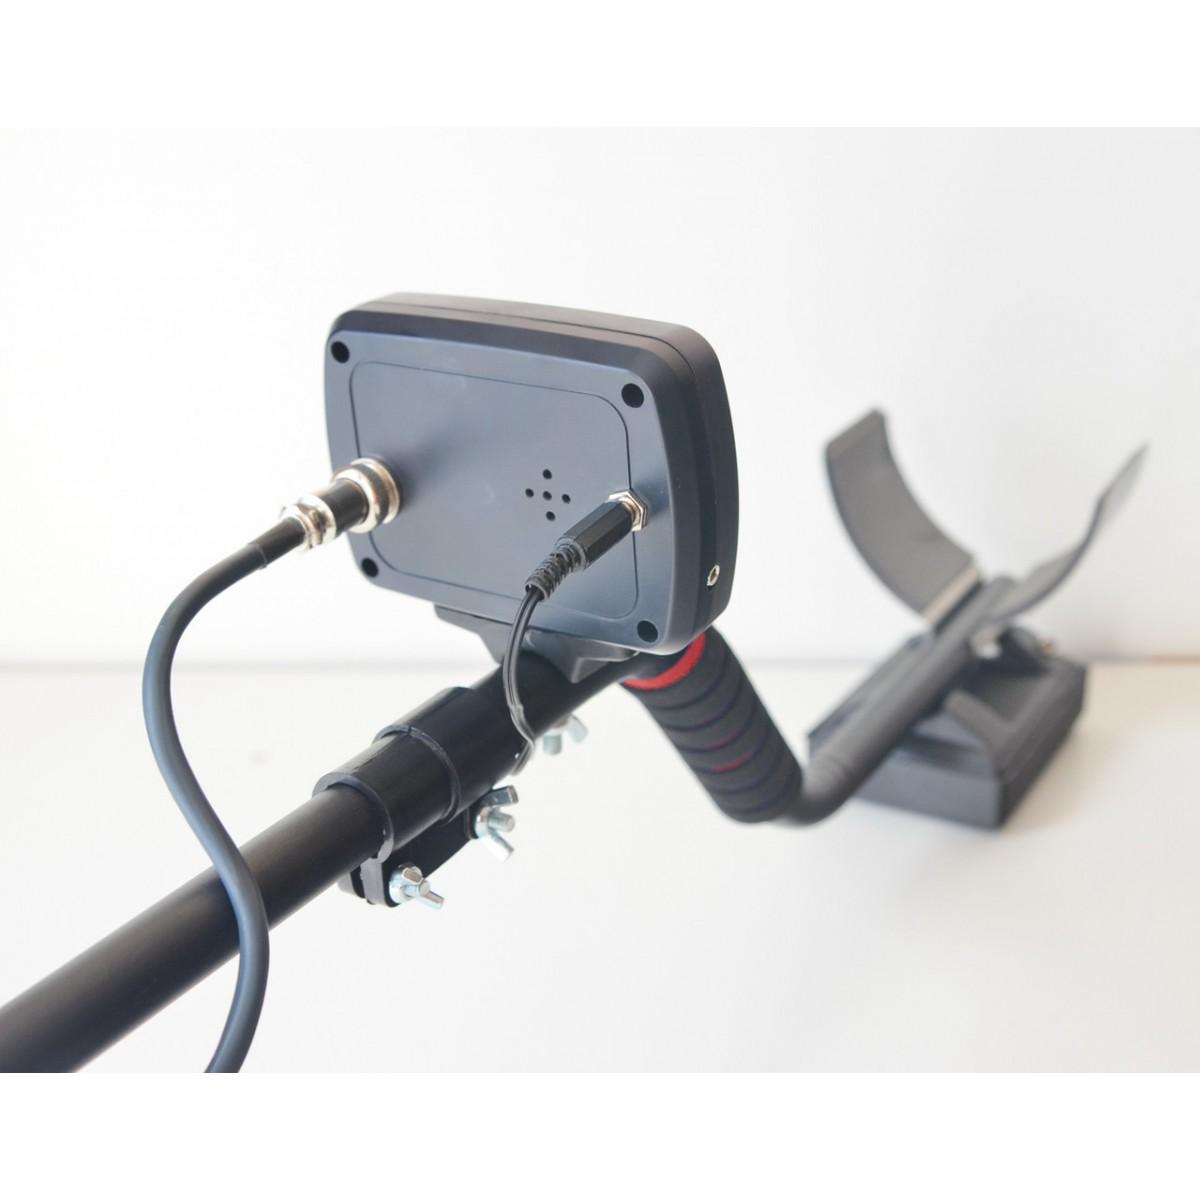 Металлоискатель Квазар АРМ/Quasar ARM корпус gainta 1910 c FM трансмиттером и регулятором тока ТХ